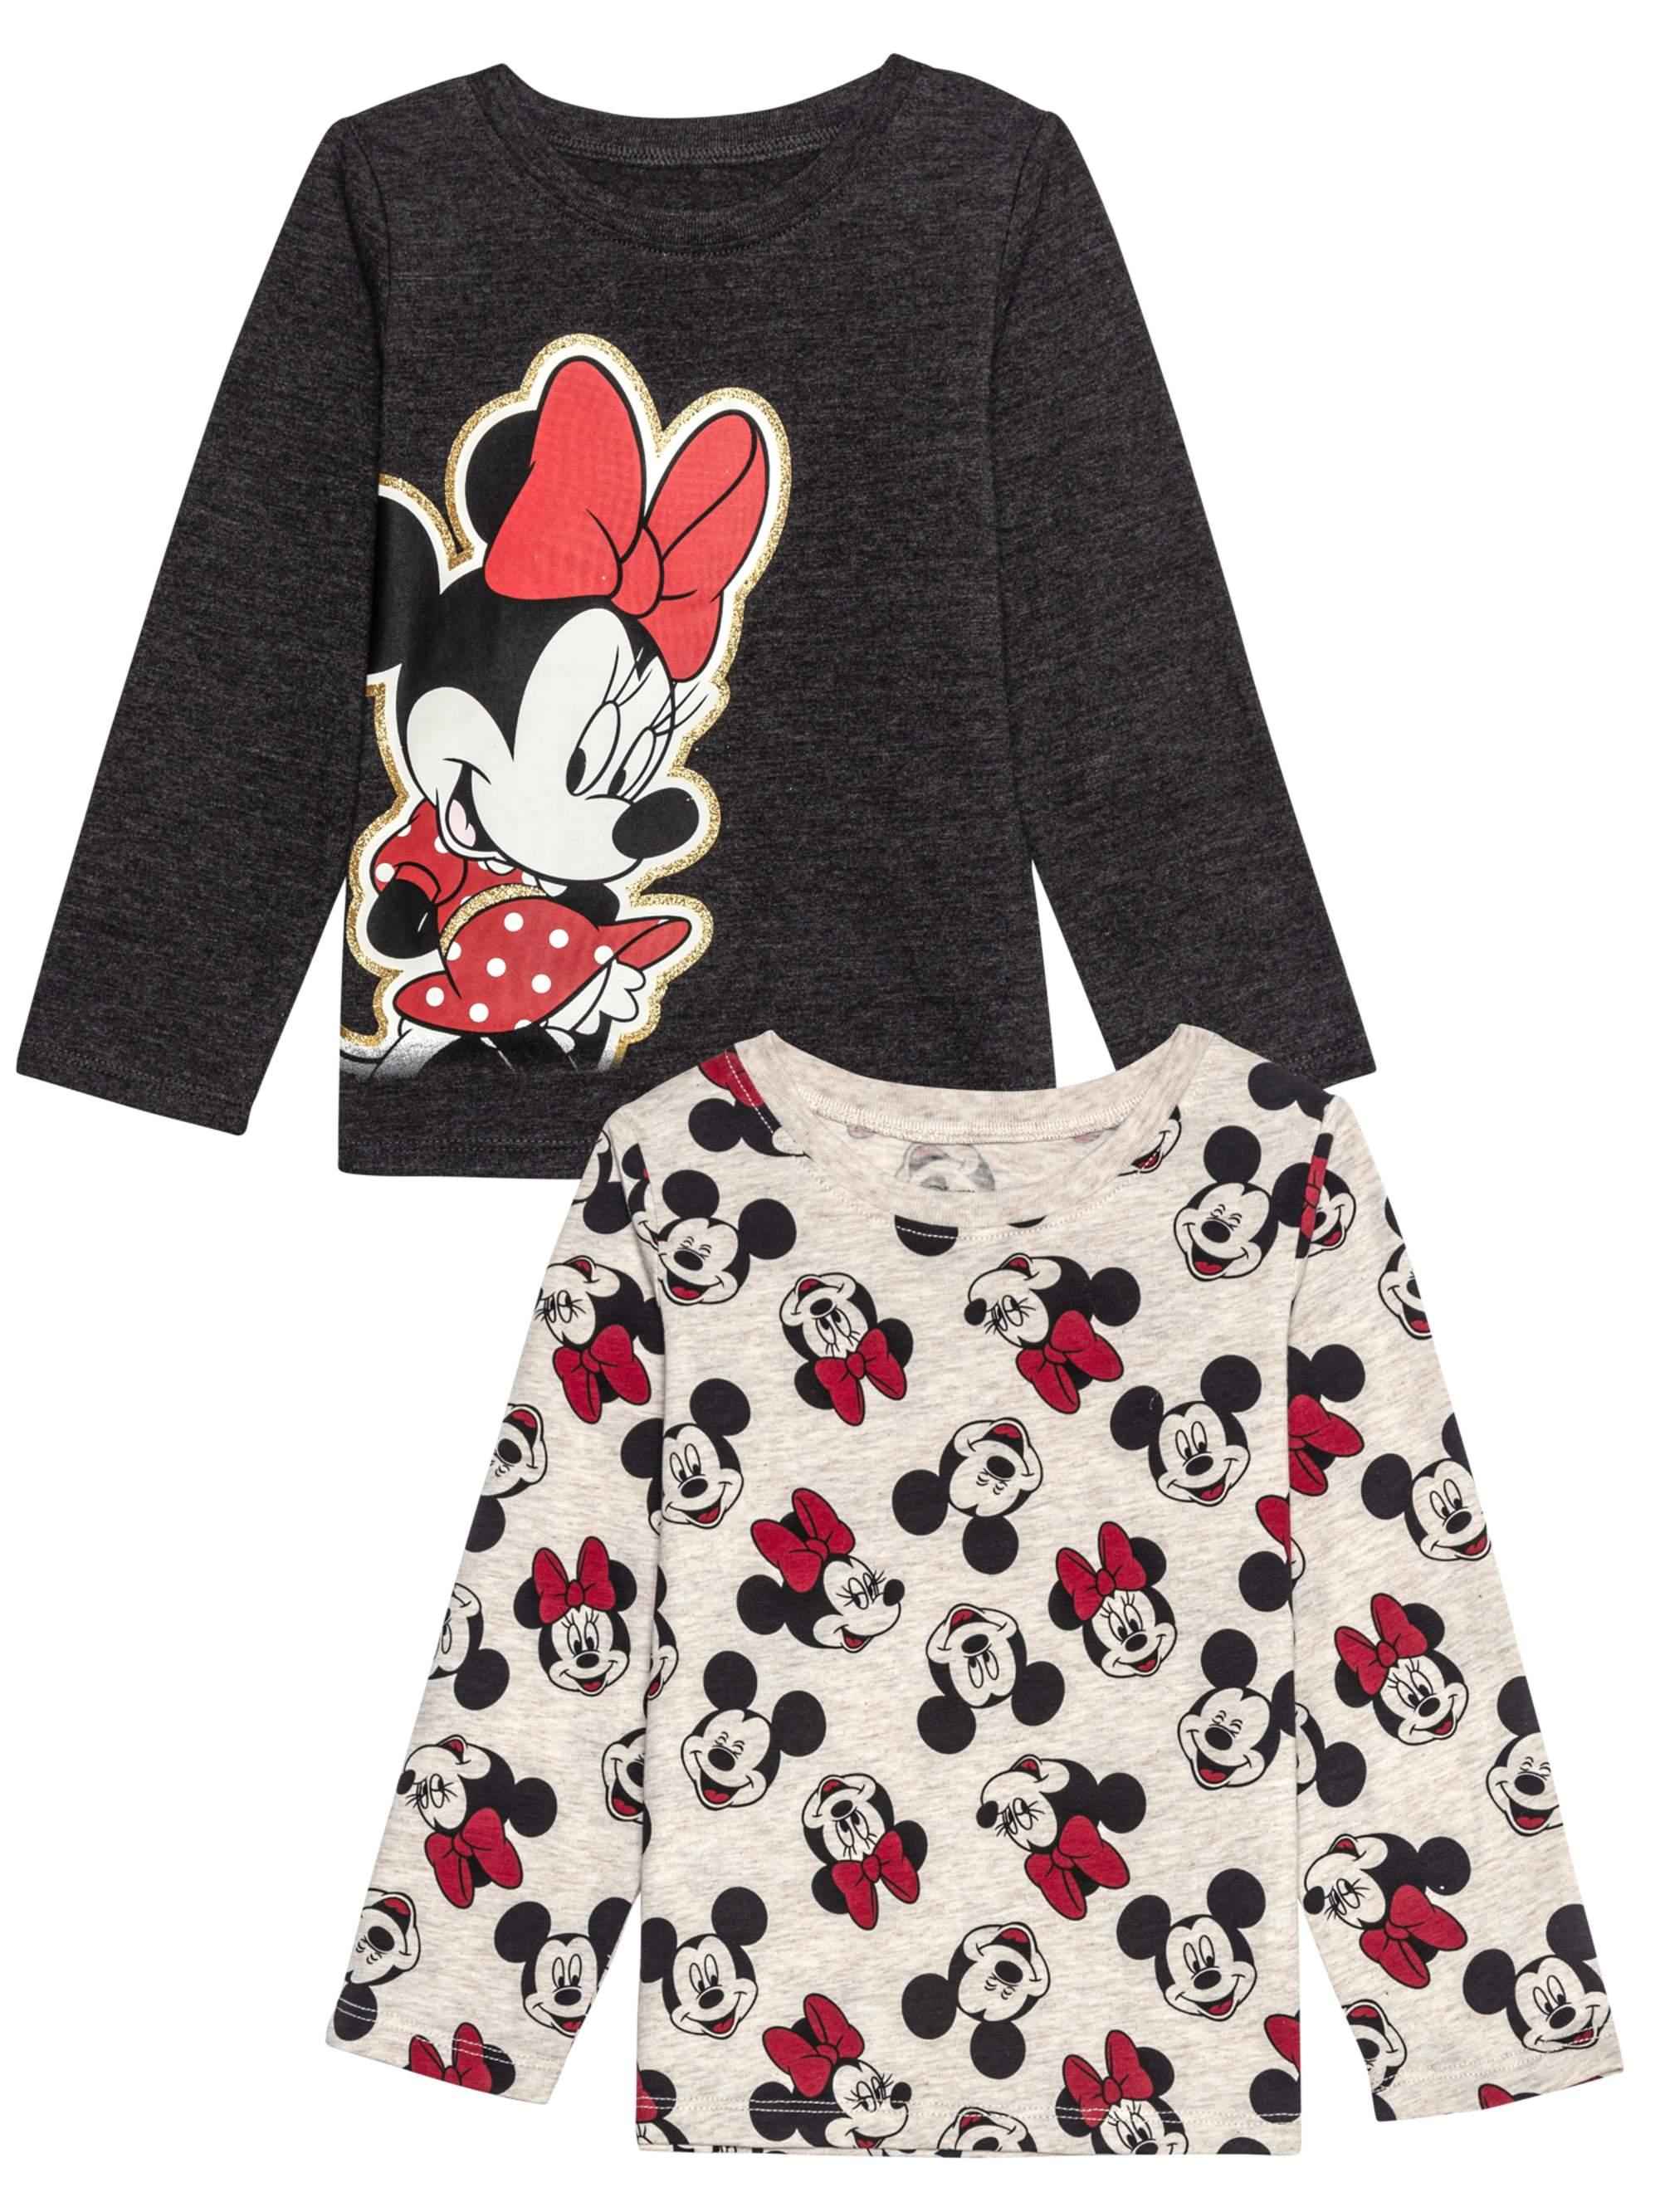 Minnie Pose Long Sleeve Graphic T-shirts 2pk (Baby Girls & Toddler Girls)